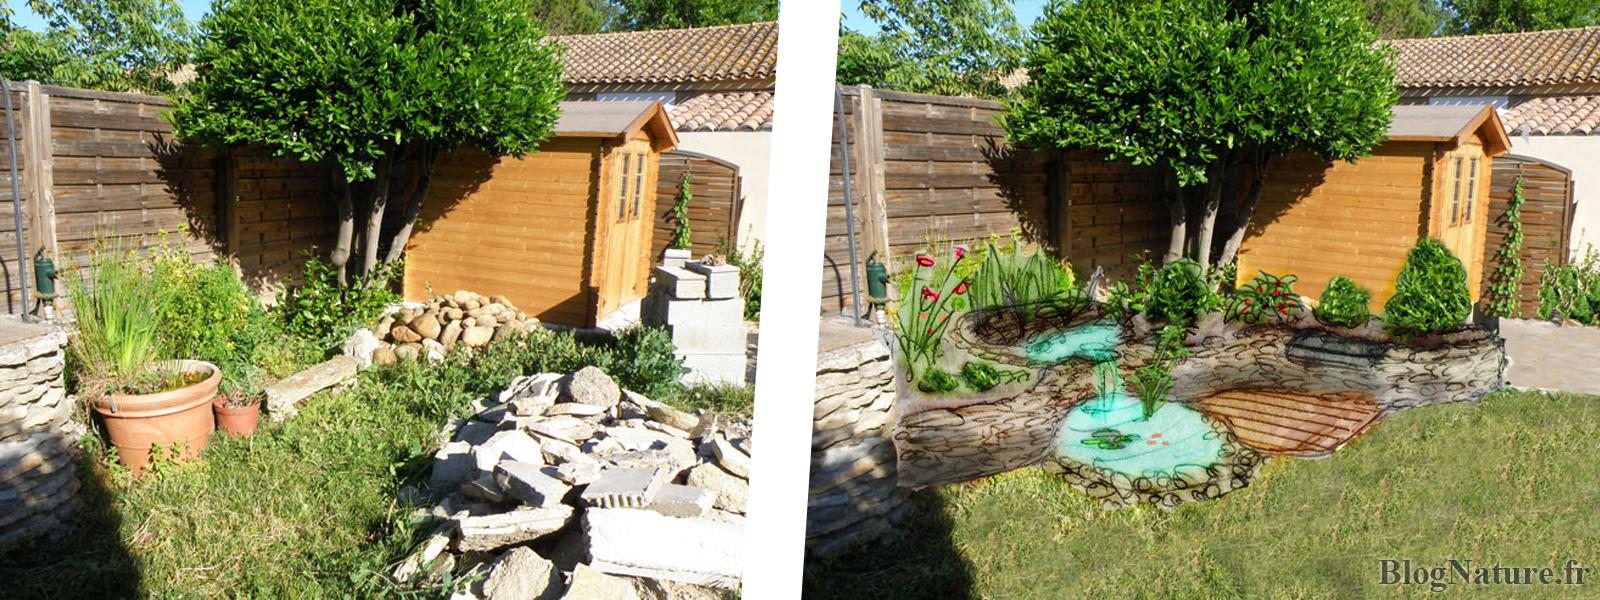 Construire Son Bassin De Jardin rêve de gosse : un bassin dans le jardin ! - blognature.fr